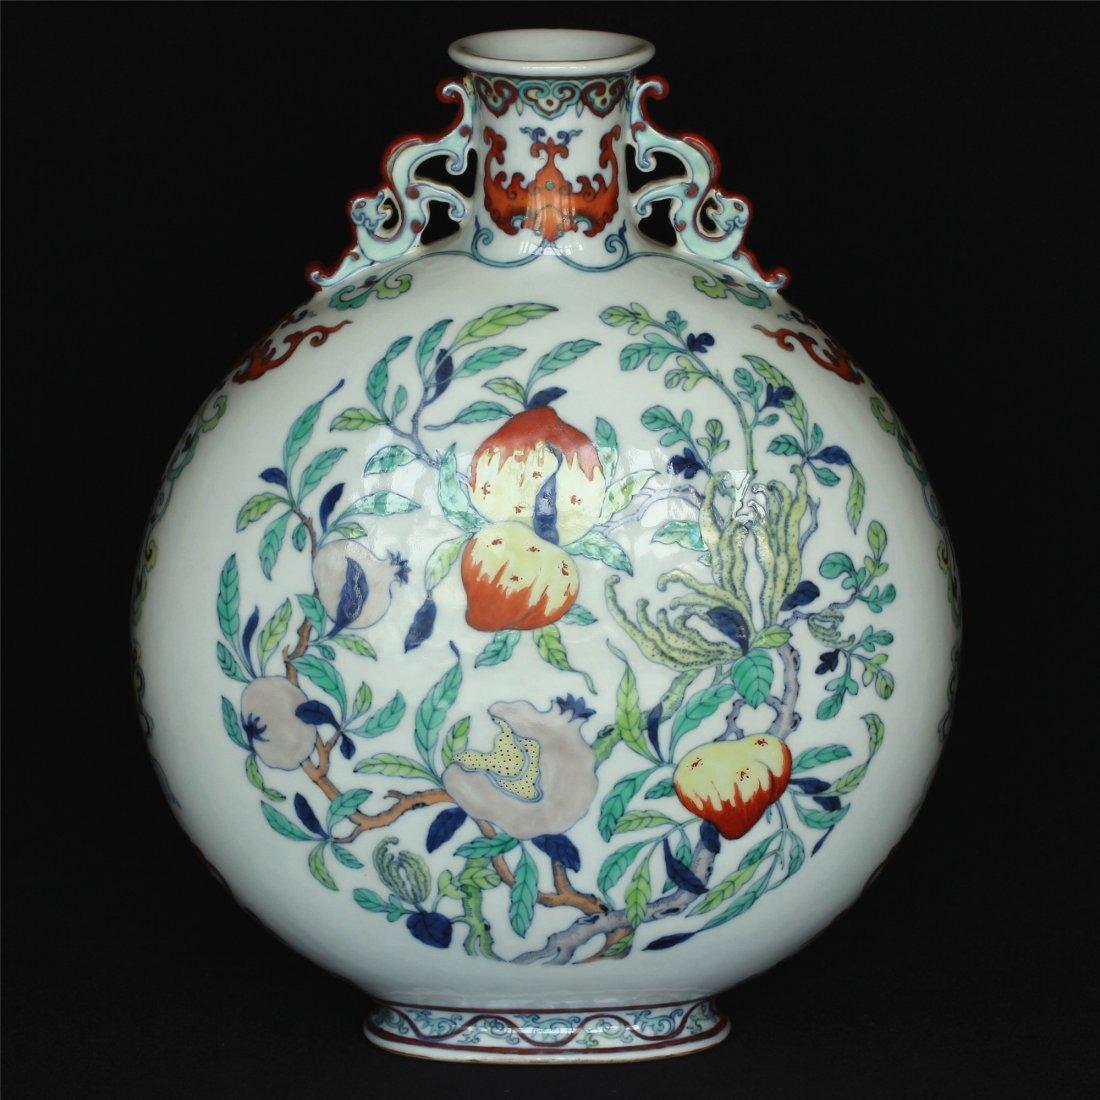 Doucai porcelain vase of Qing Dynasty QianLong mark.